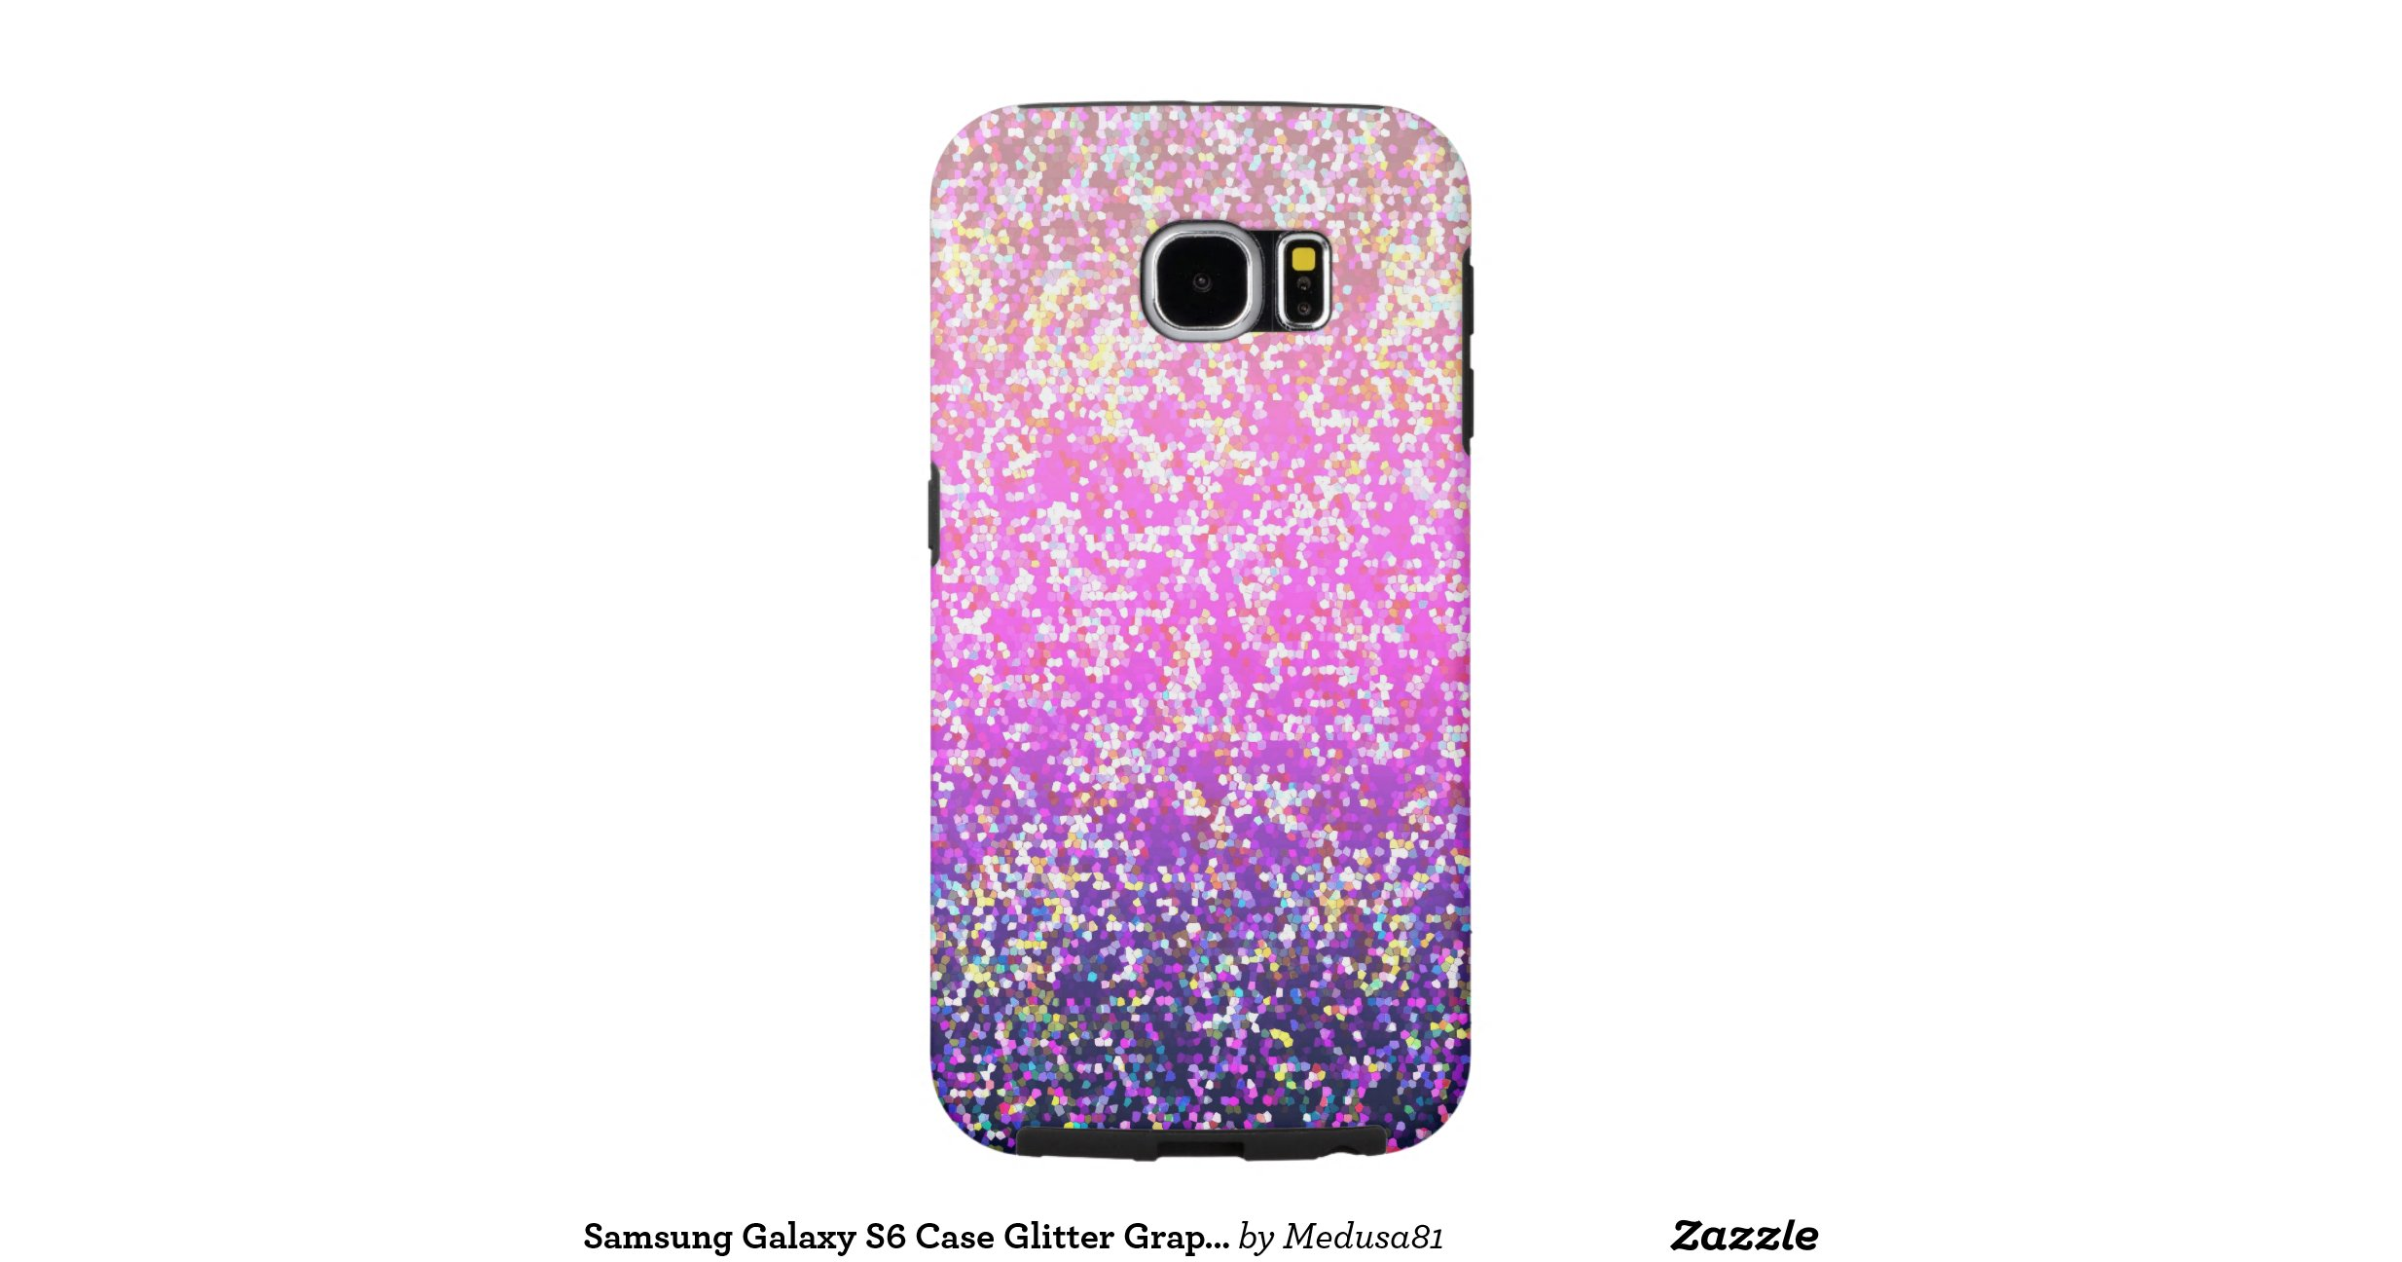 Samsung Galaxy S6 Case Glitter Graphic